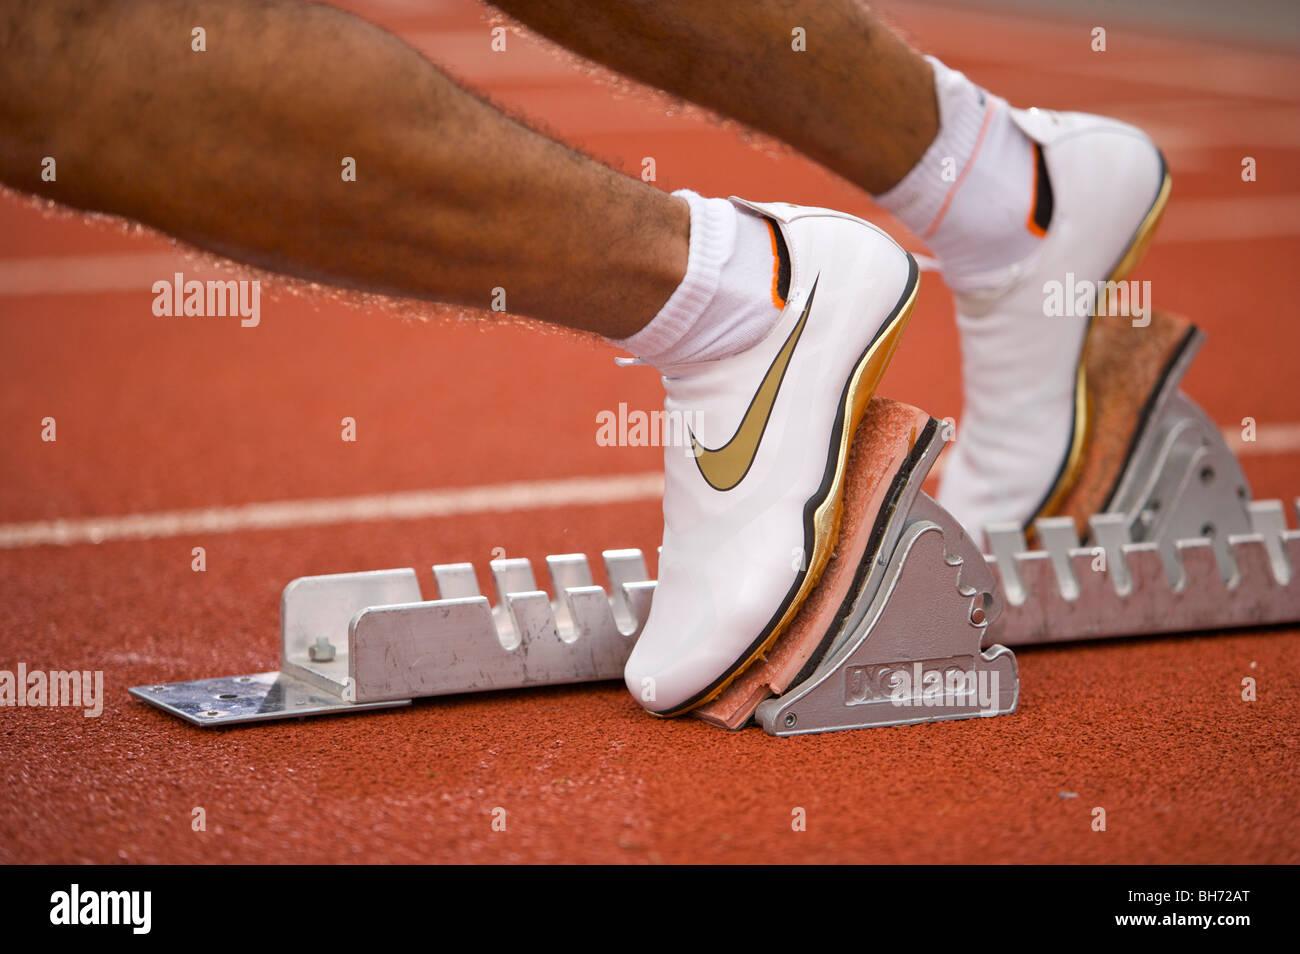 Olympics, 2012, running, track, lanes, athletics, sports, feet, track, field, starting, blocks, sport, cleats, feet, - Stock Image